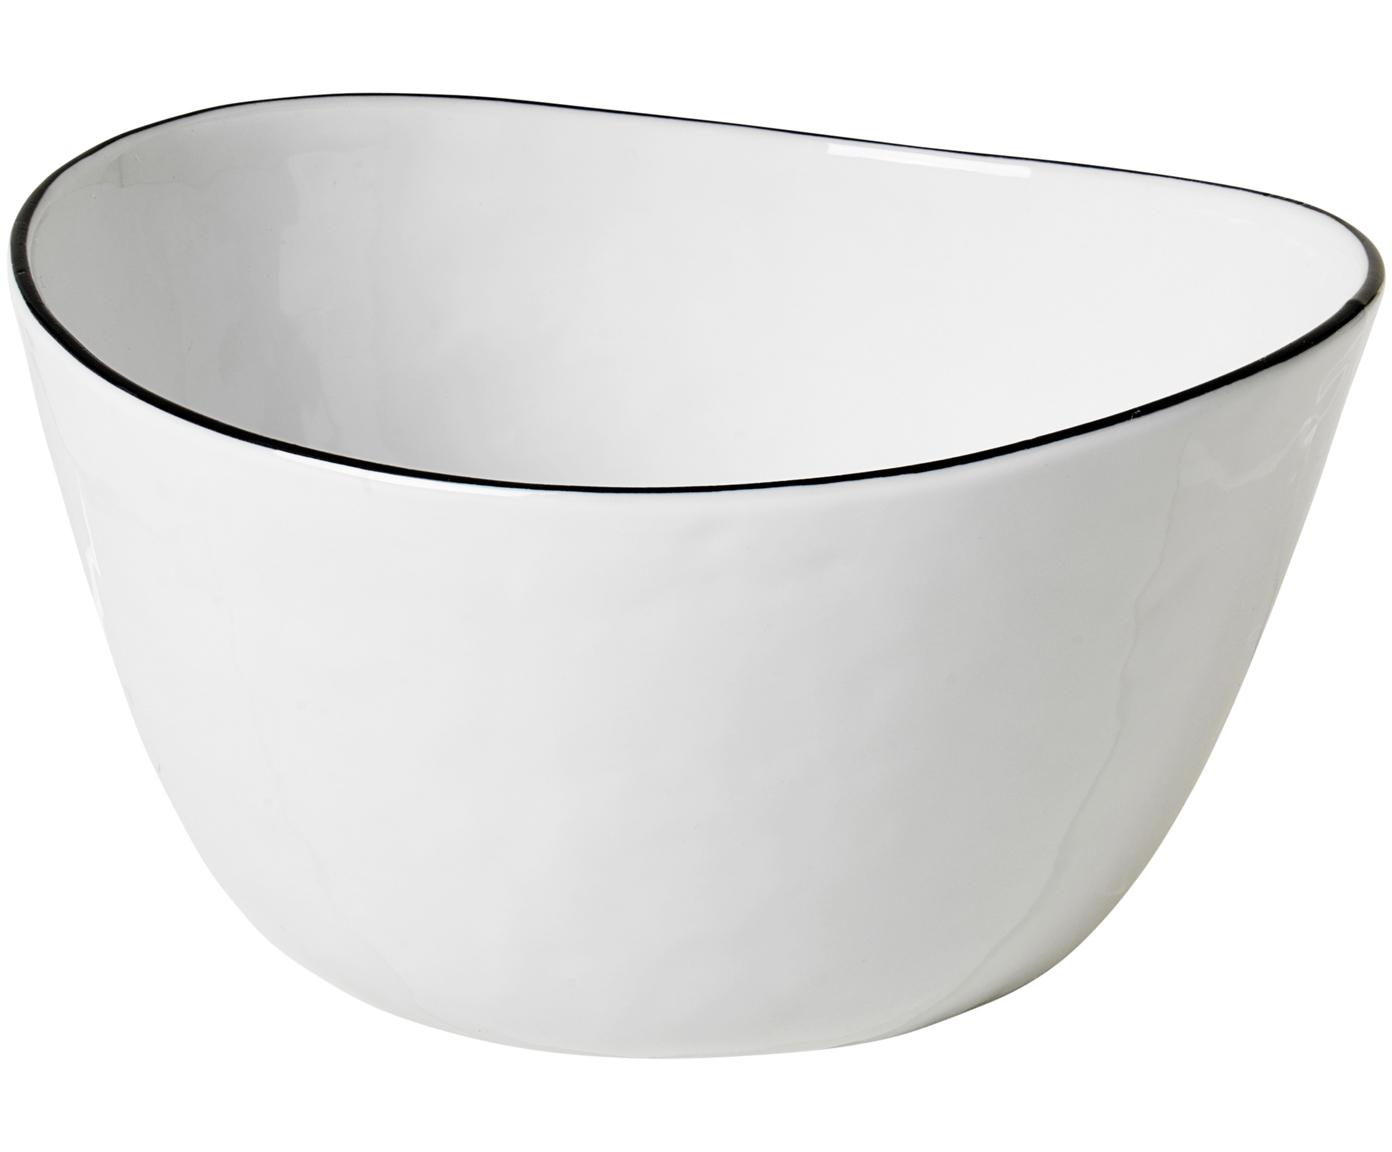 Bol artesanal Salt, Porcelana, Blanco crudo, An 20 x F 19 cm